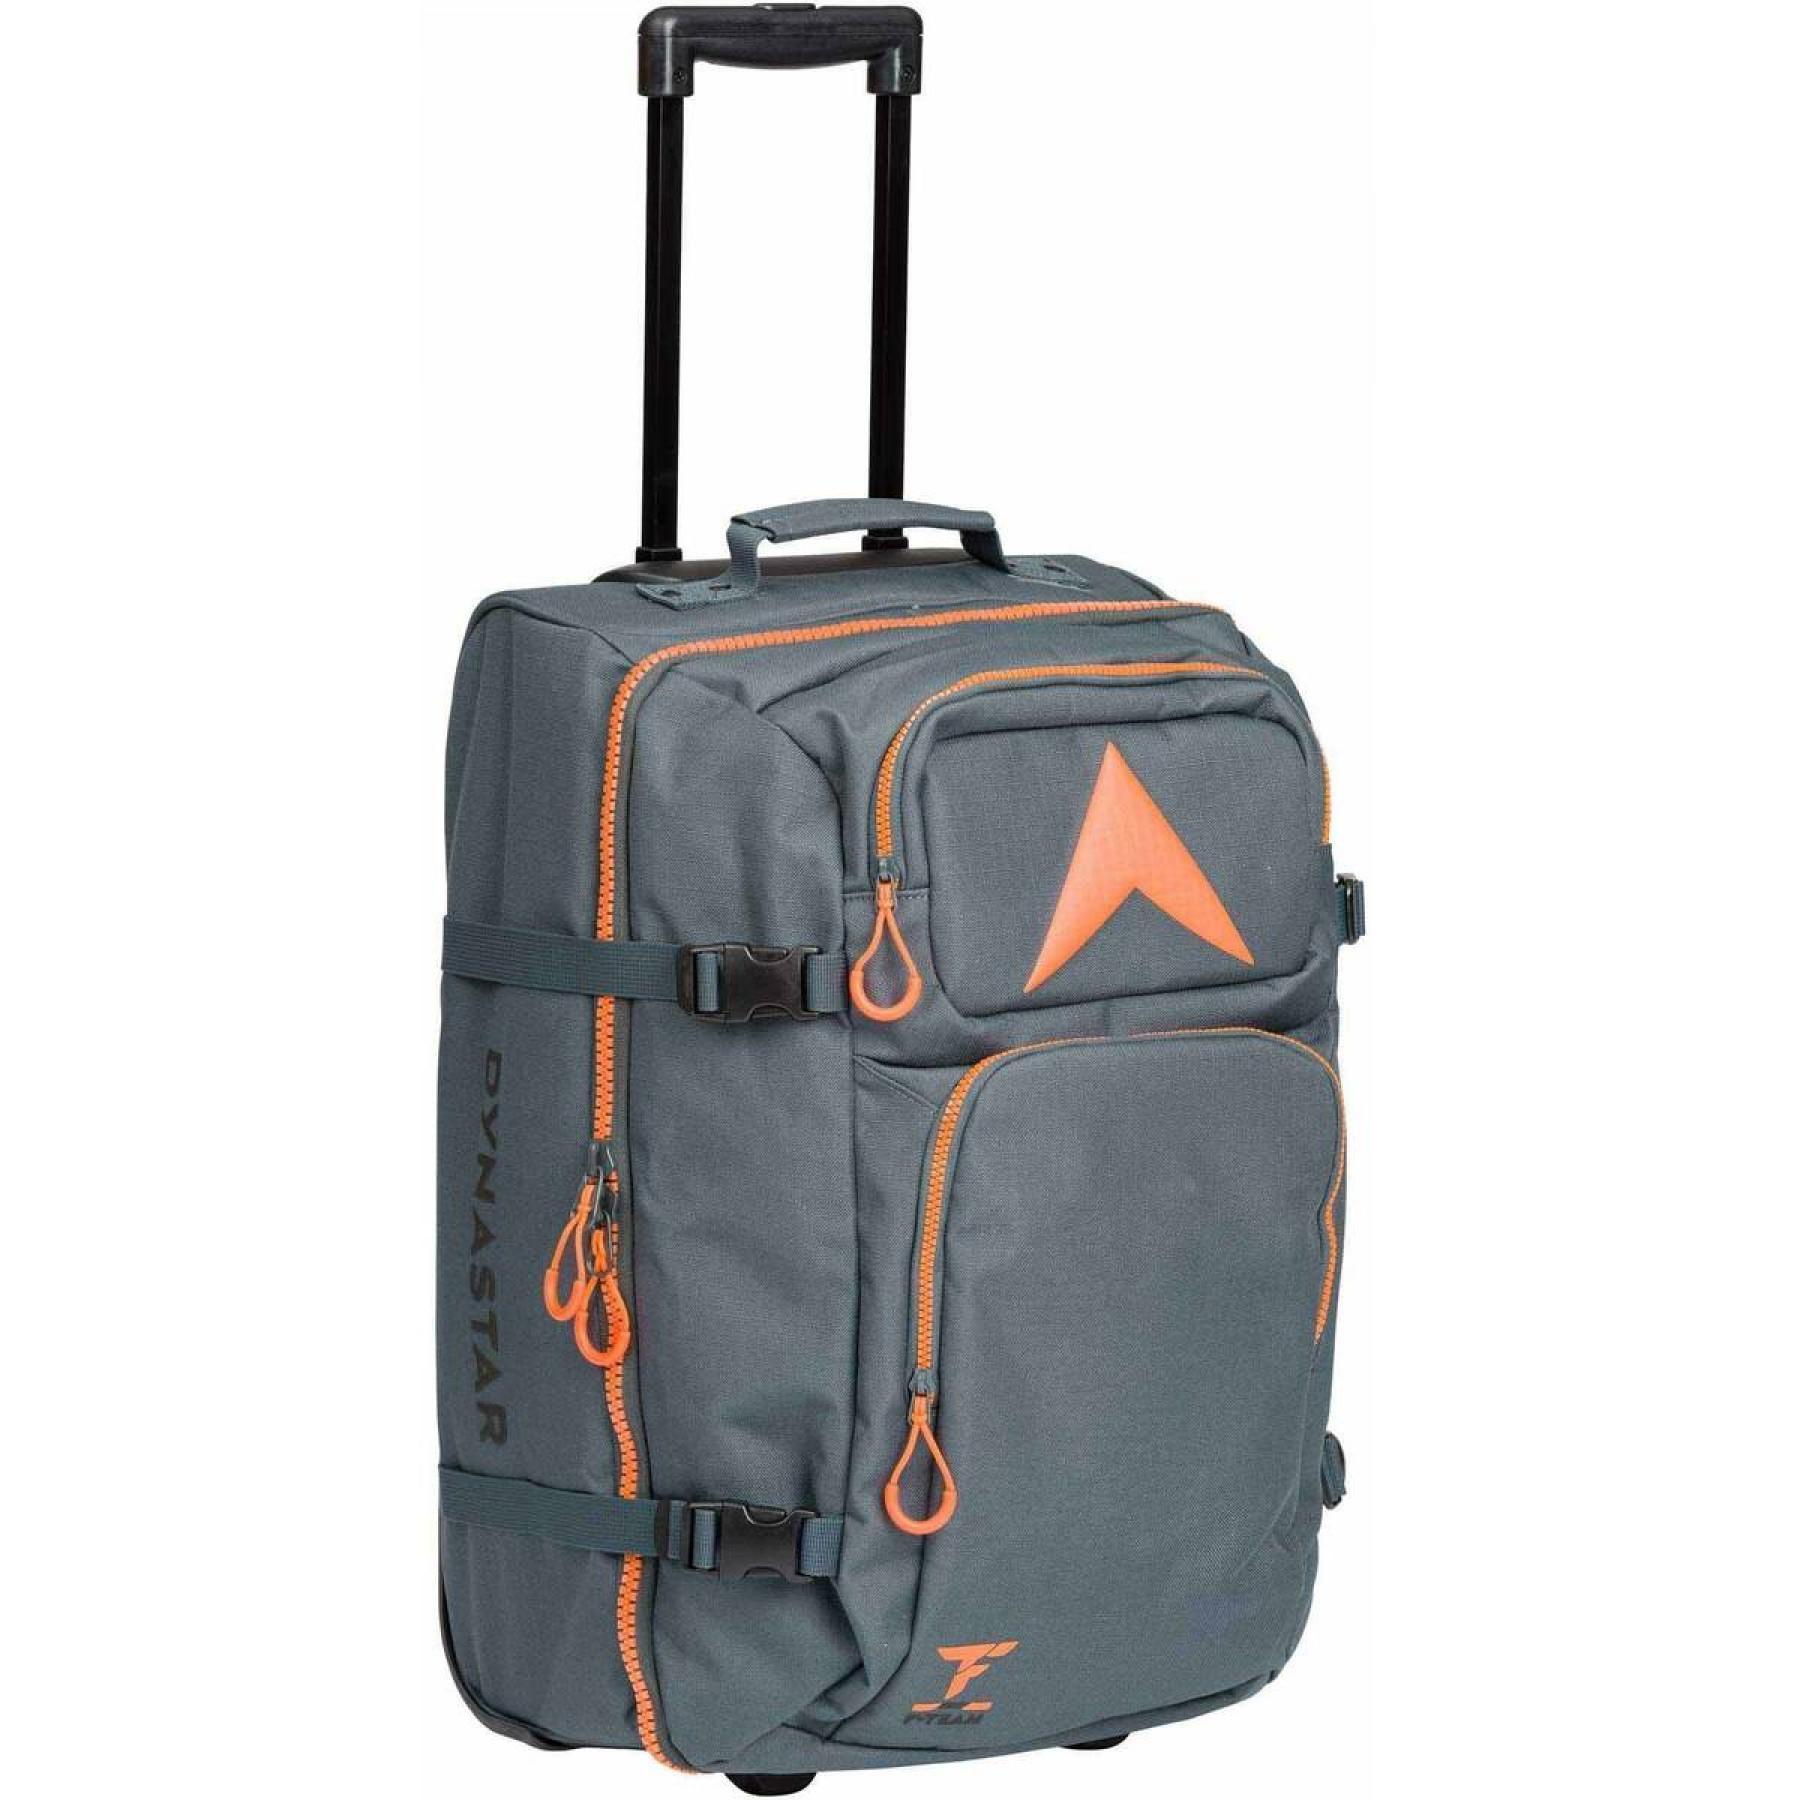 Travel bag Dynastar speed